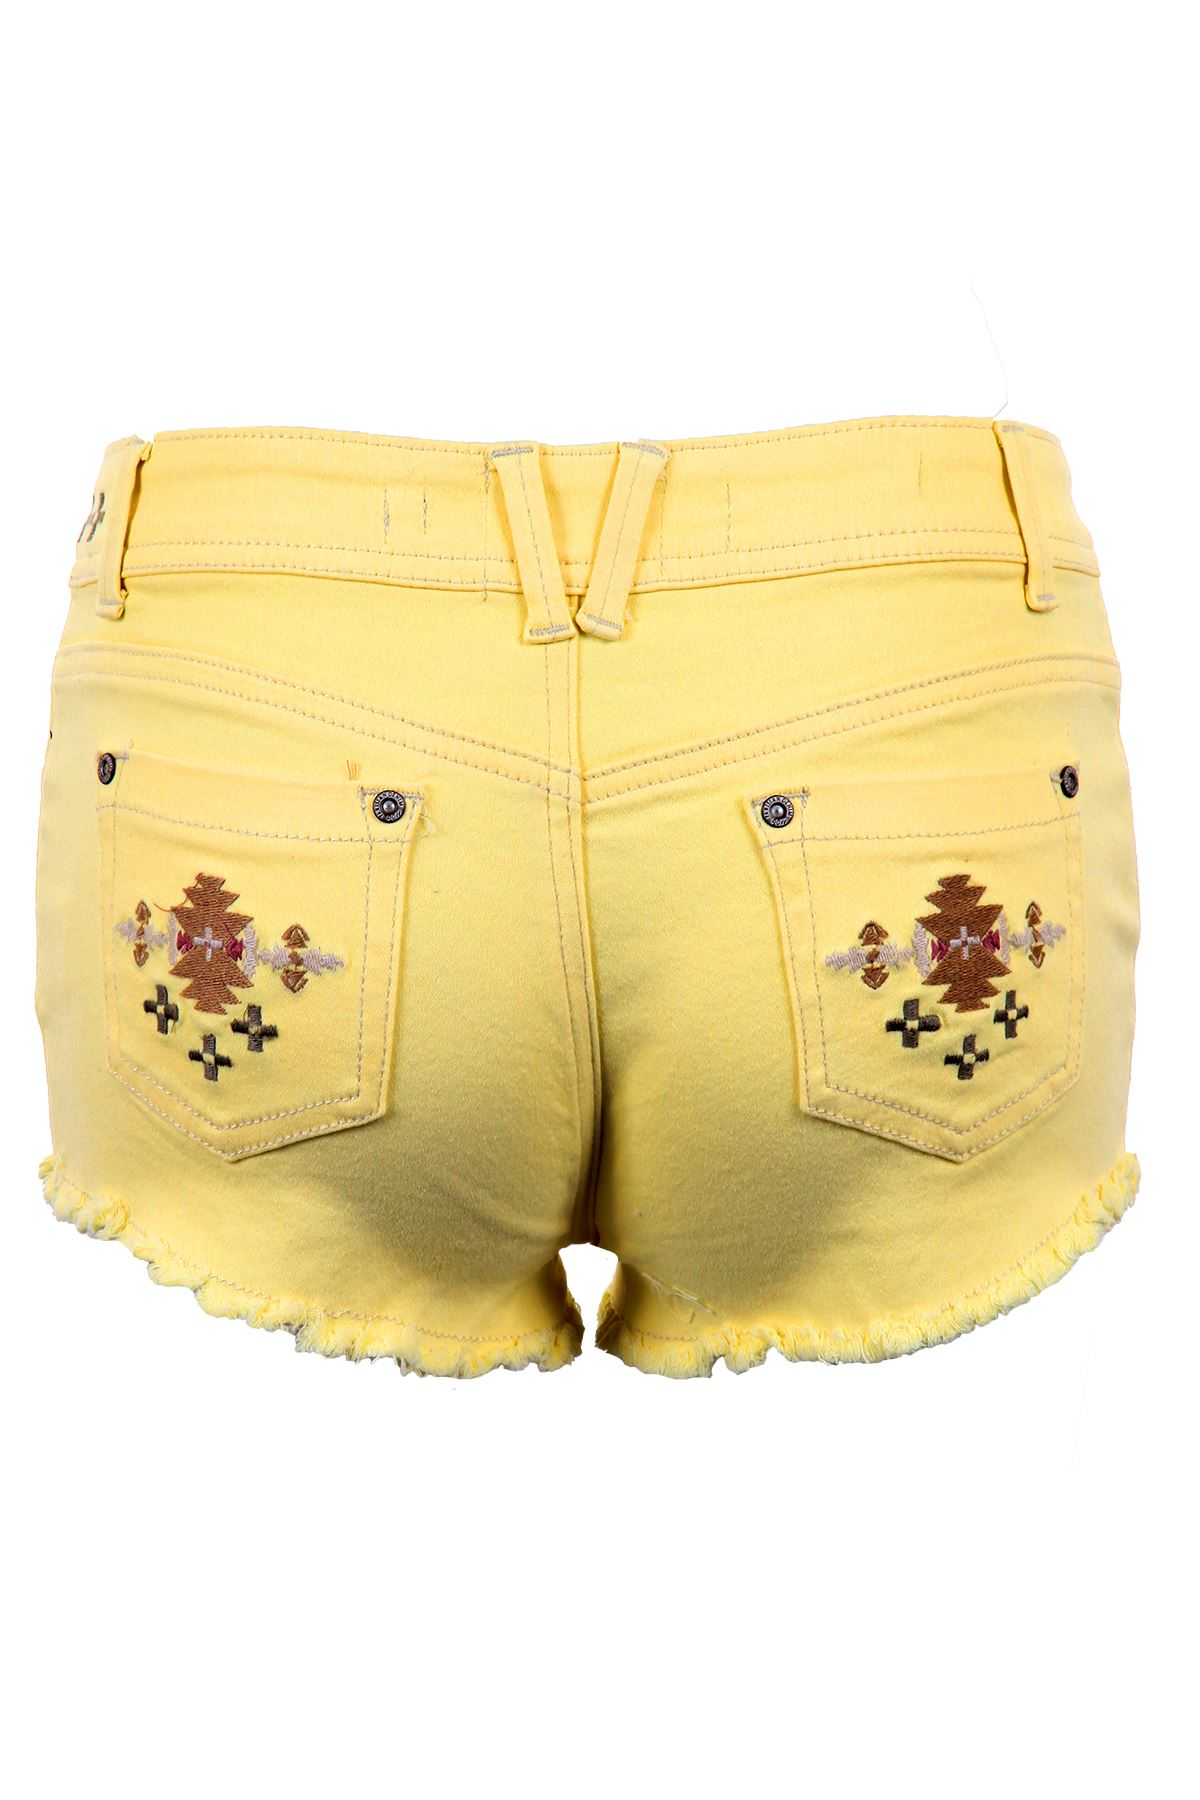 Women-039-s-Pastel-Coloured-Aztec-Denim-Summer-Fitted-Hot-Pants-Shorts-Jeans-6-14